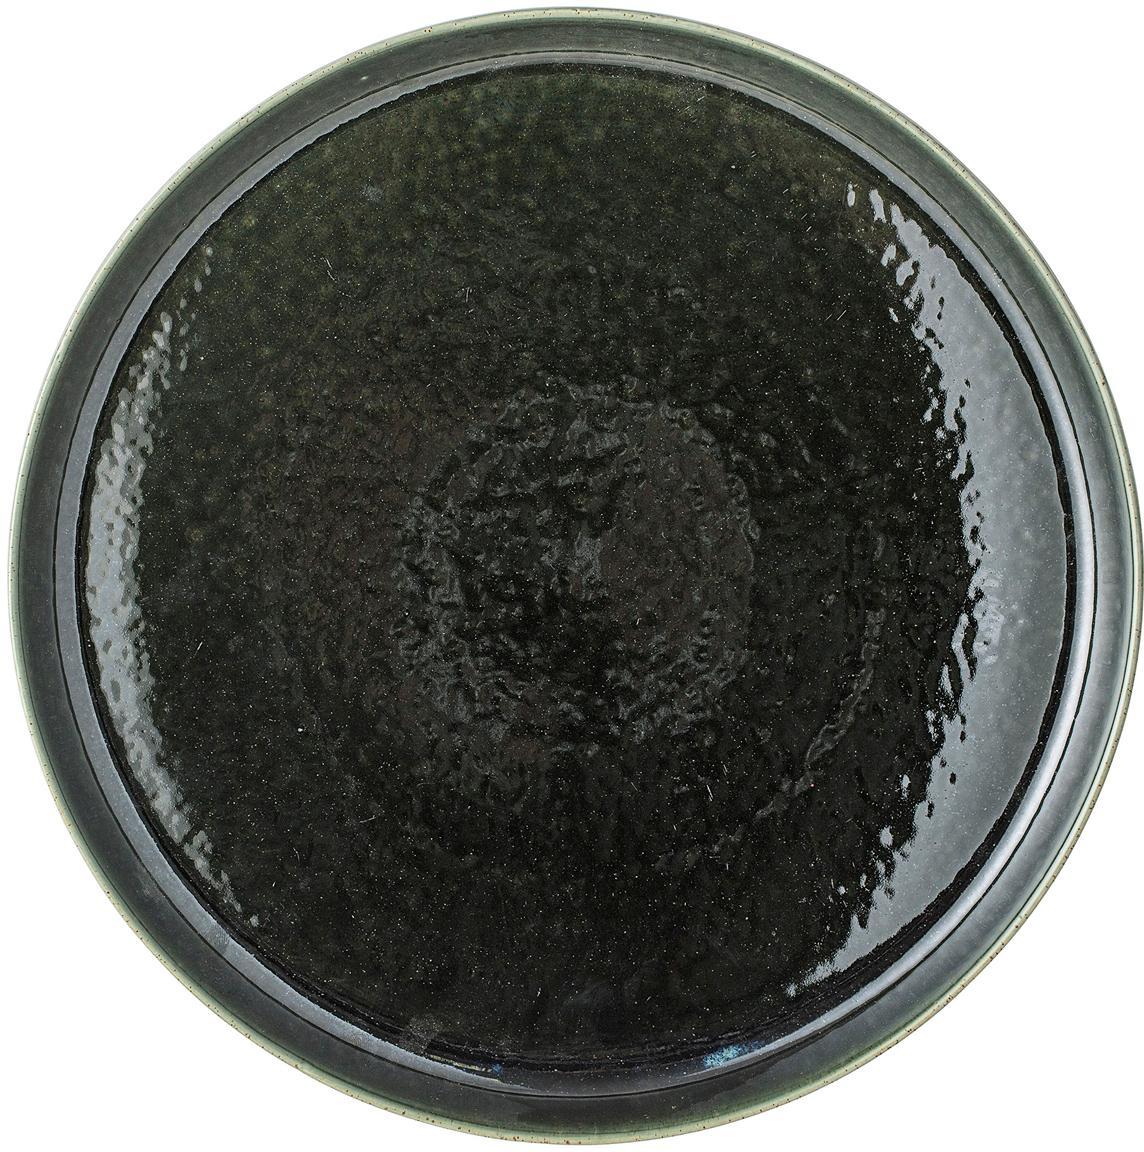 Handgemaakt dienblad Lara, Keramiek, Donkergroen, Ø 33 cm